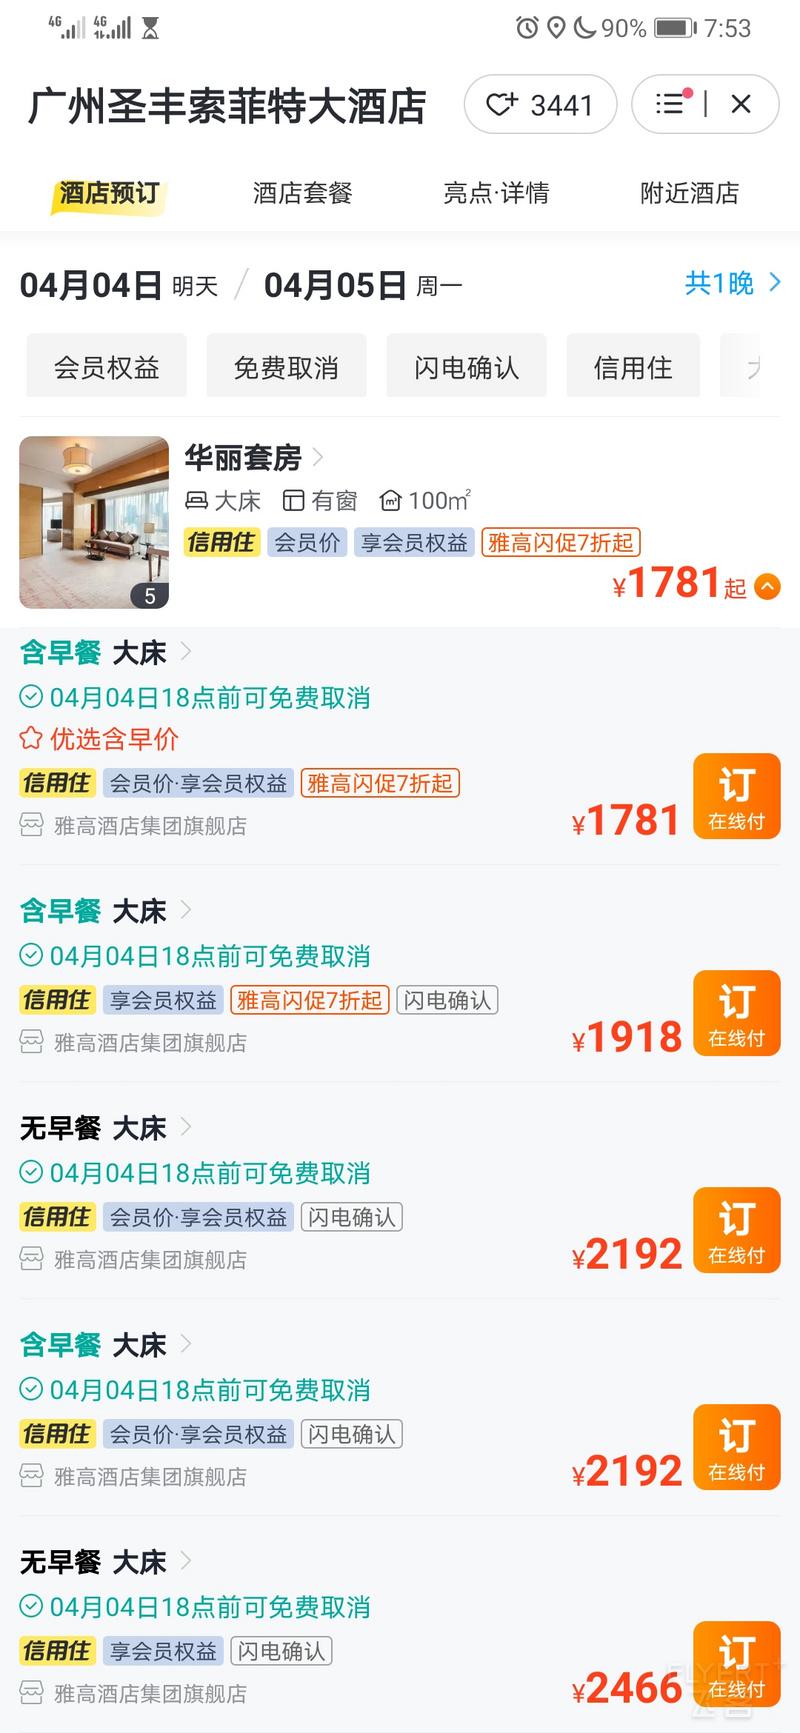 Screenshot_20210403_195345_com.taobao.trip.jpg